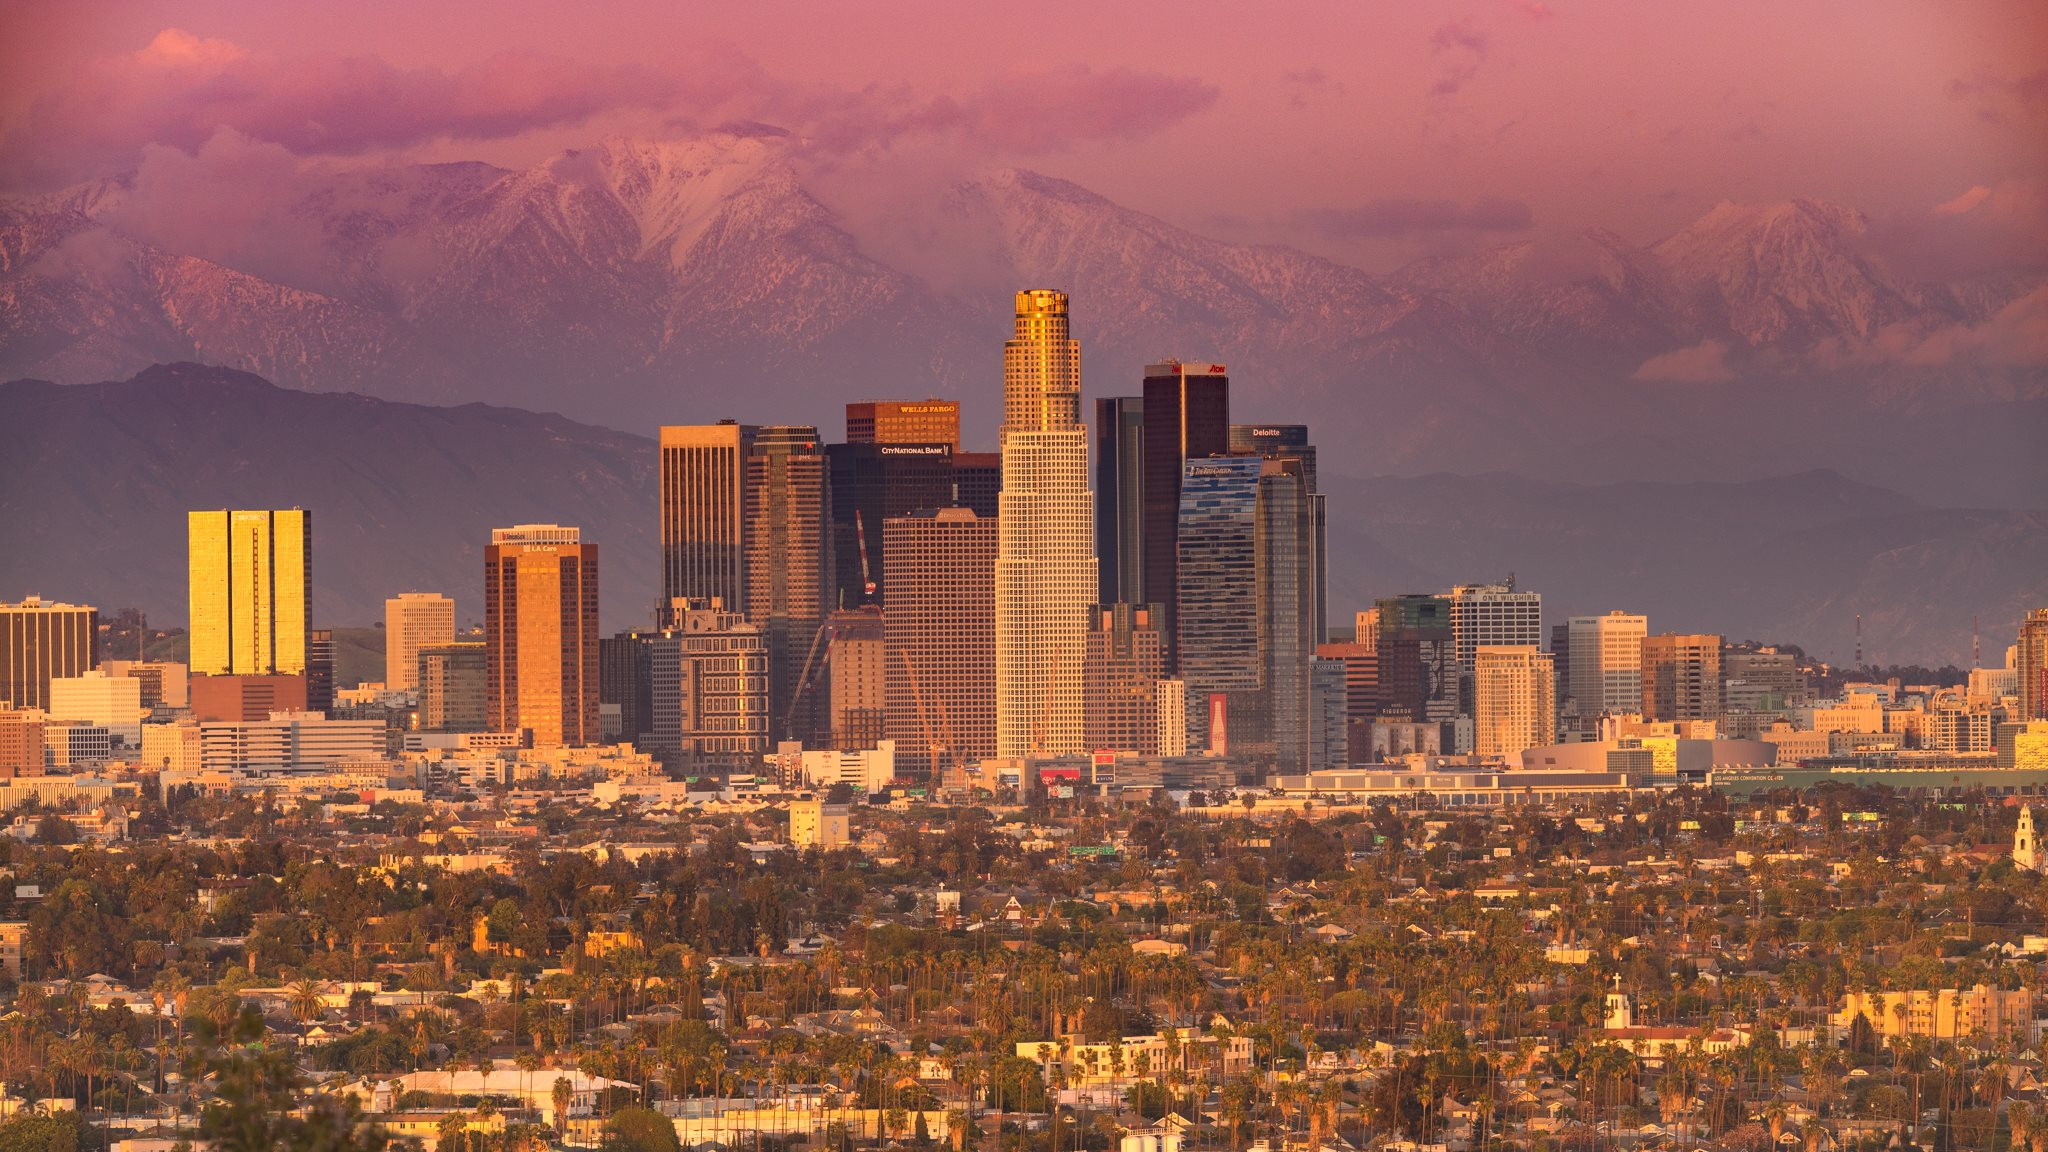 Los Angeles Timelapse